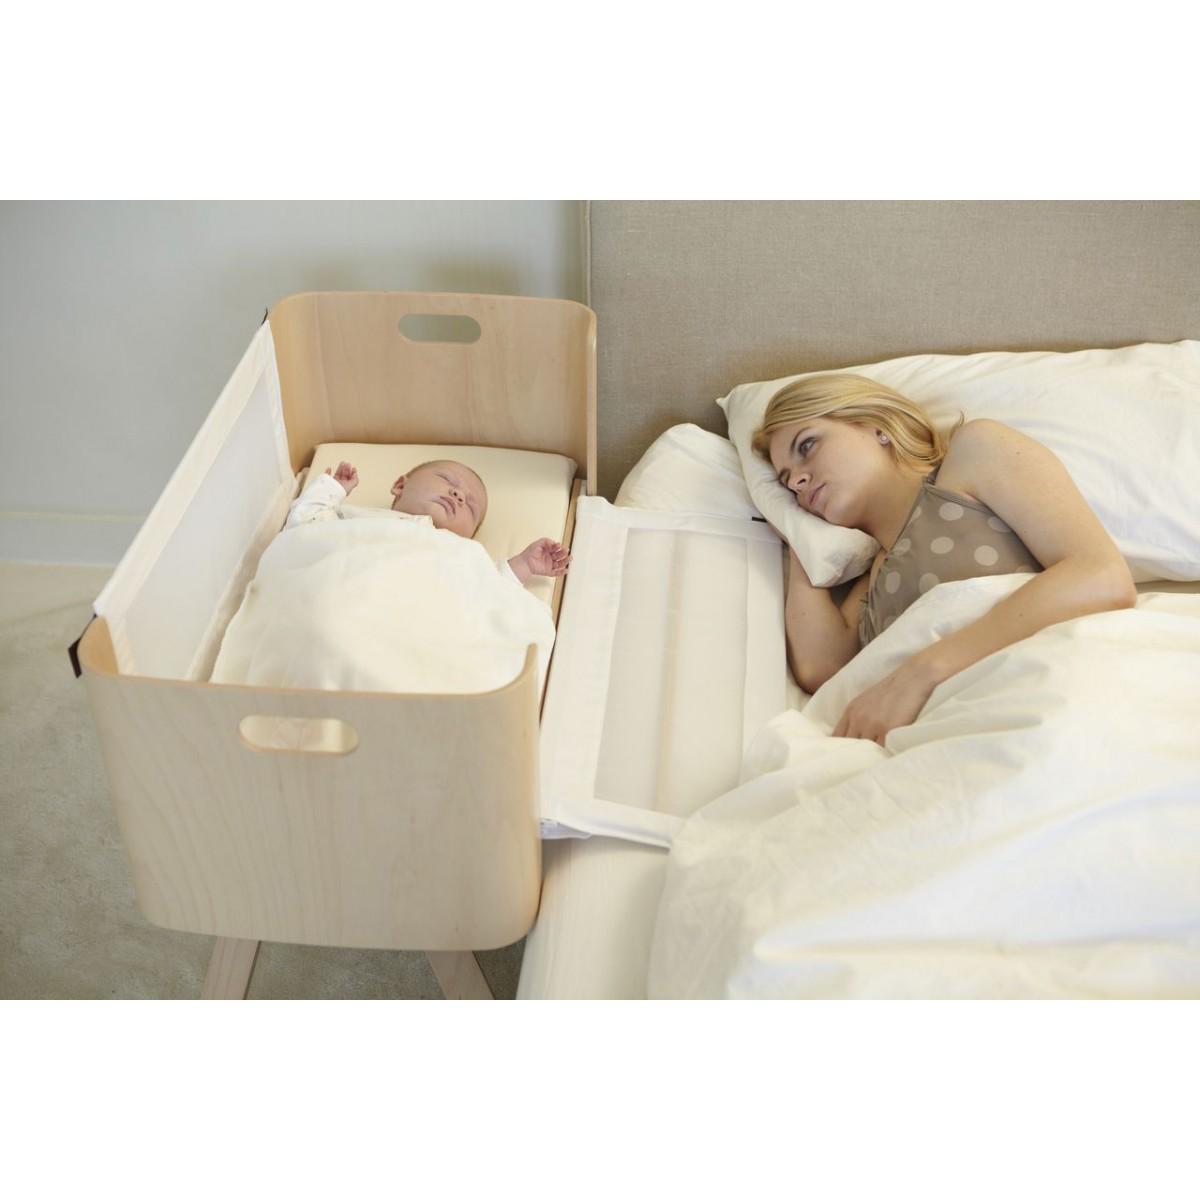 lit co dodo berceau de chevet sebio. Black Bedroom Furniture Sets. Home Design Ideas